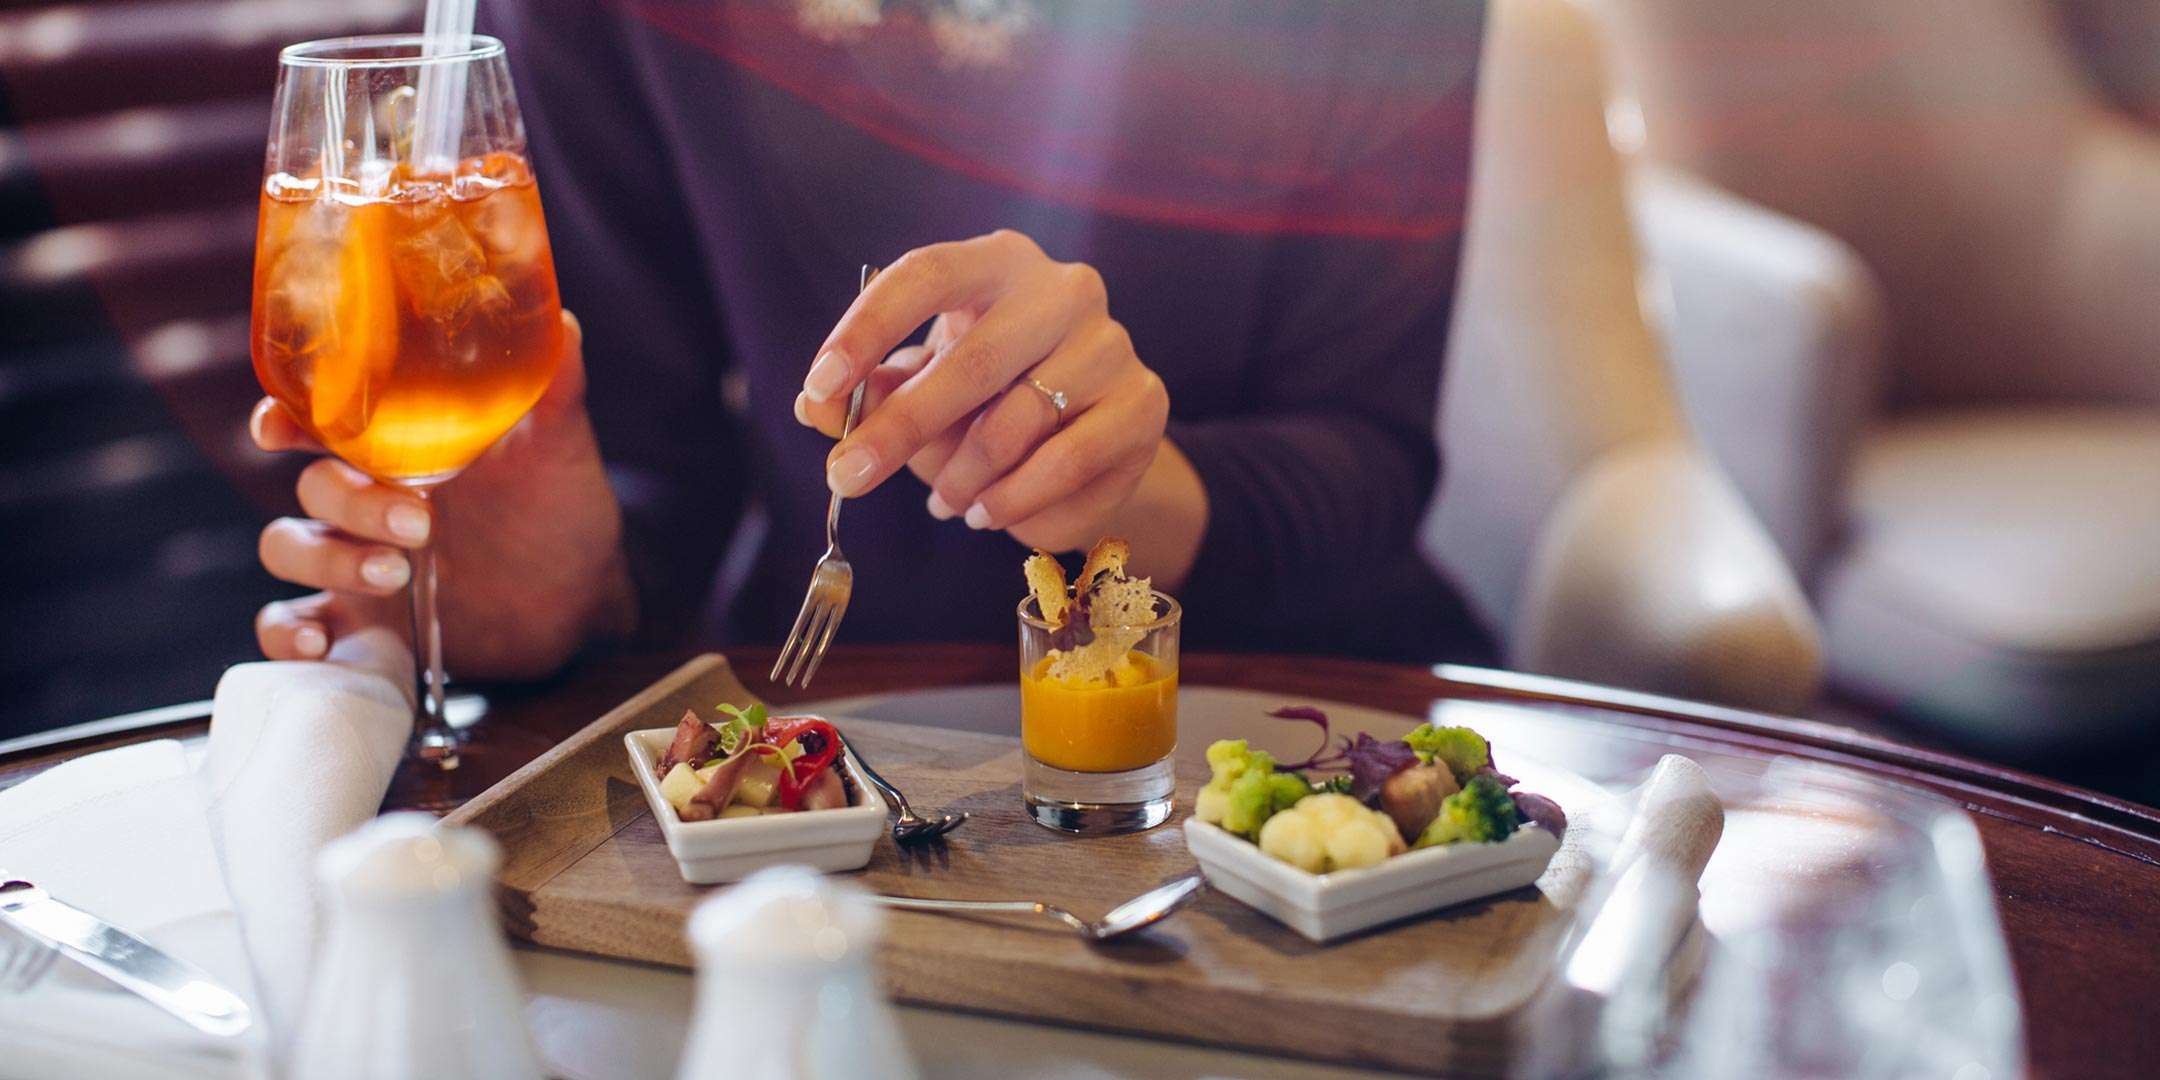 Breakfast2-Image-Rectangle-2160x1080